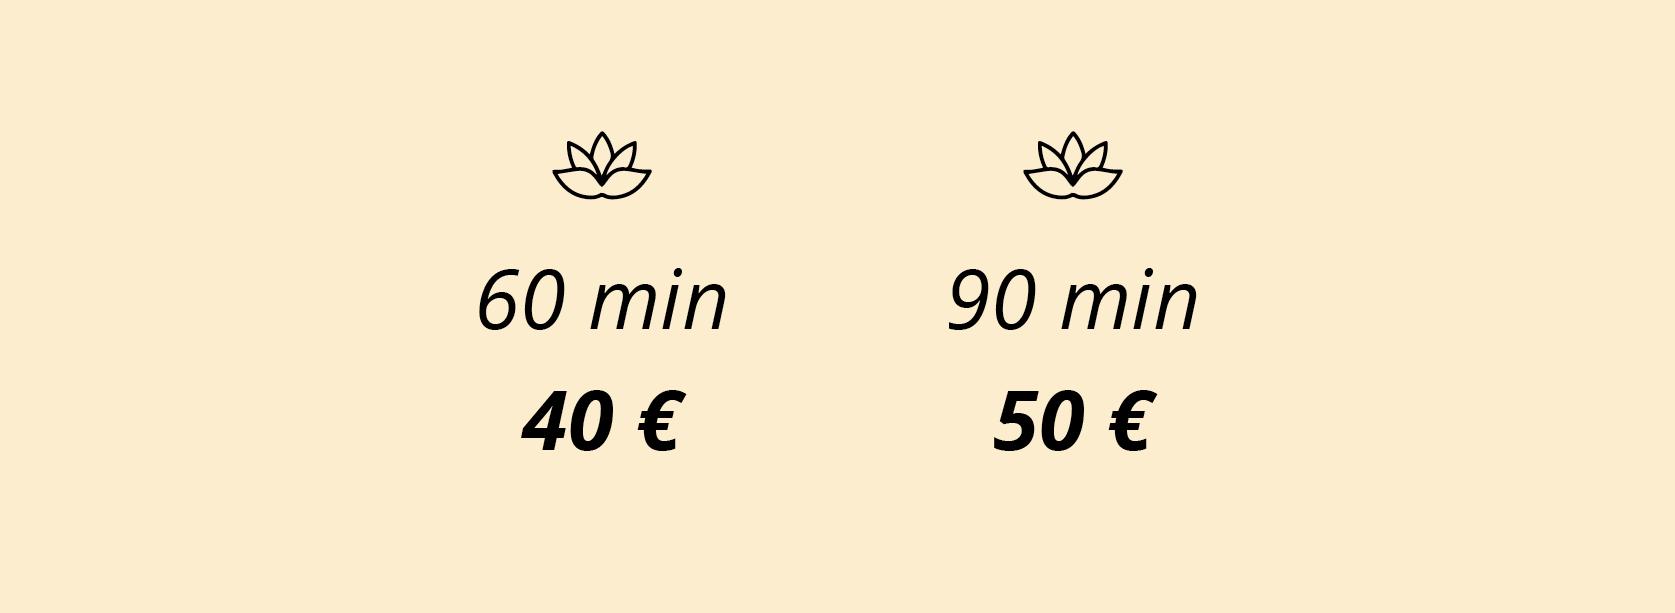 nebo sport price